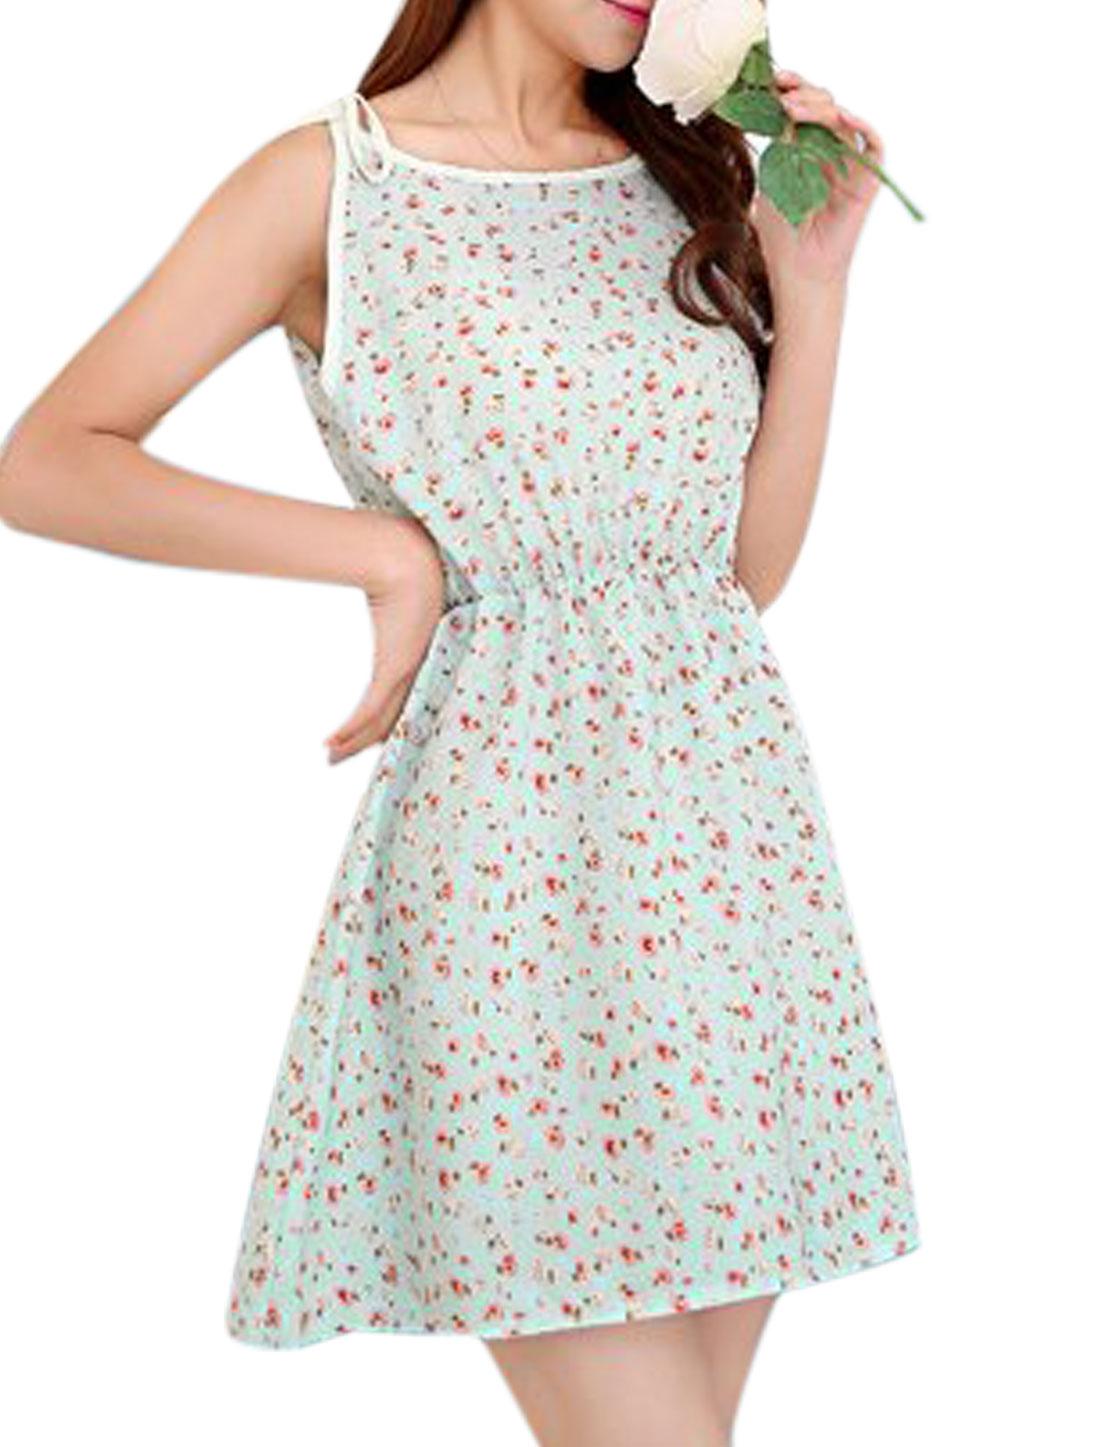 Lady Self Tie Straps Sleeveless Flower Prints Sun Dress Sky Blue XS